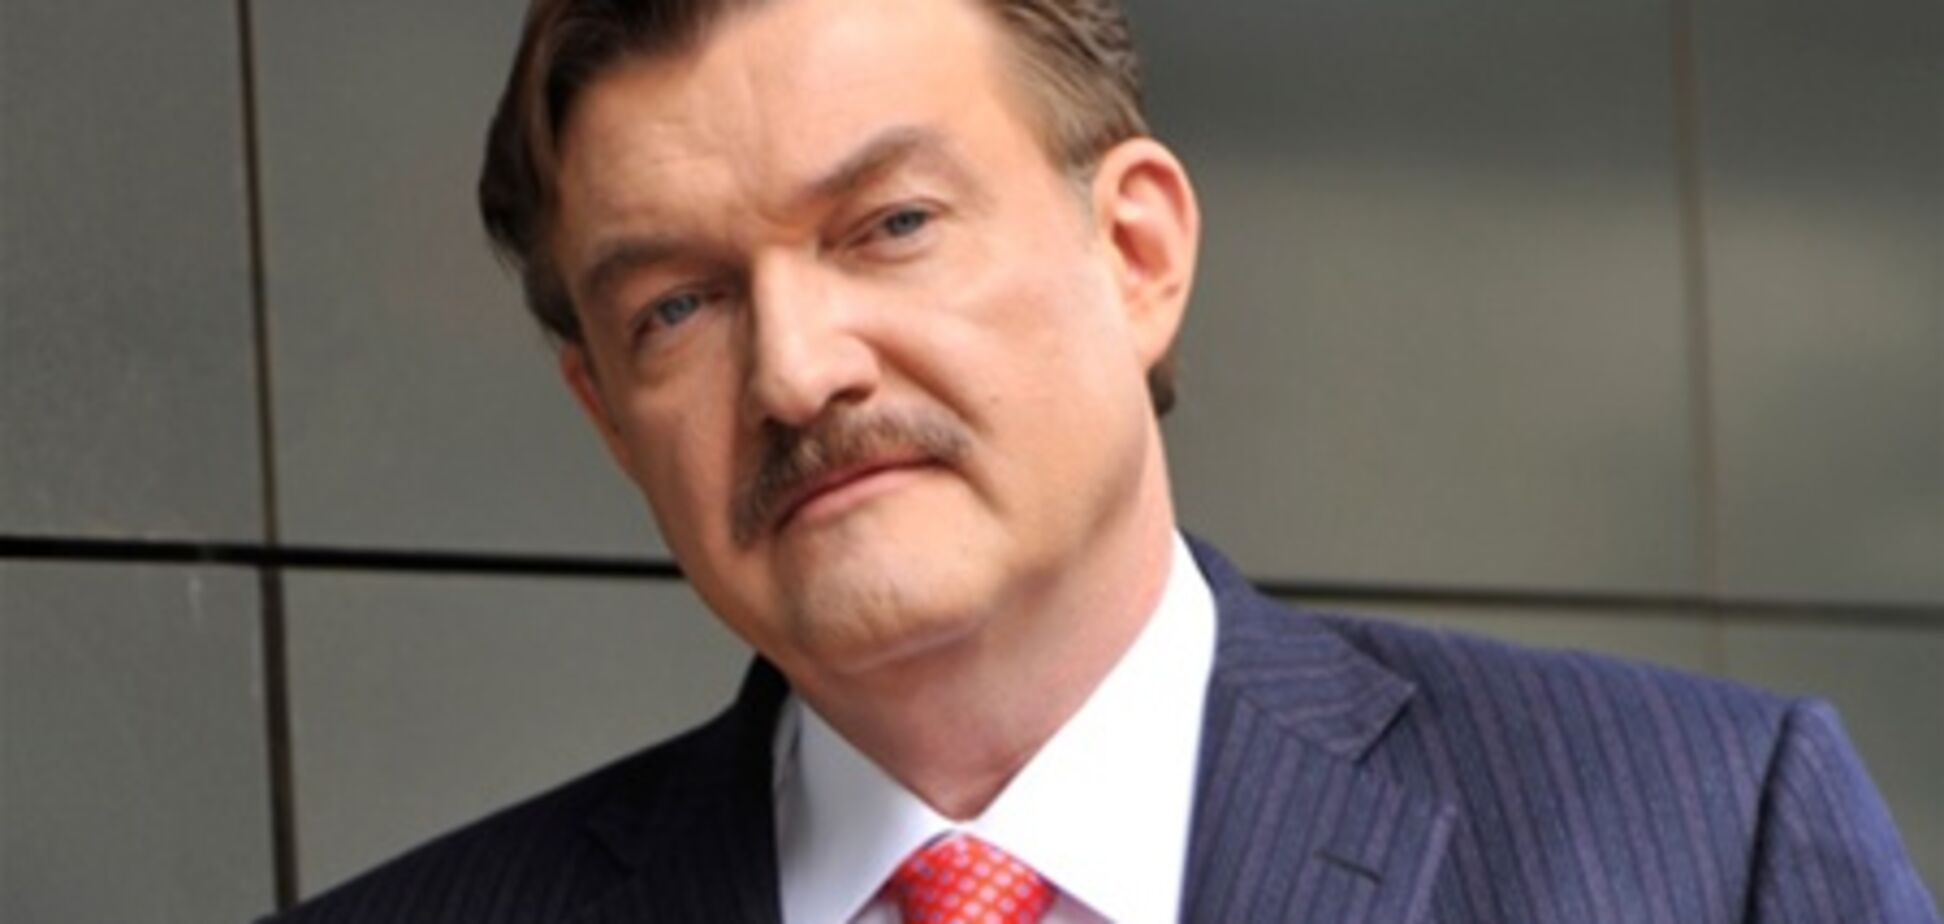 На 'Интере' уже решили, кто заменит ведущего Киселева